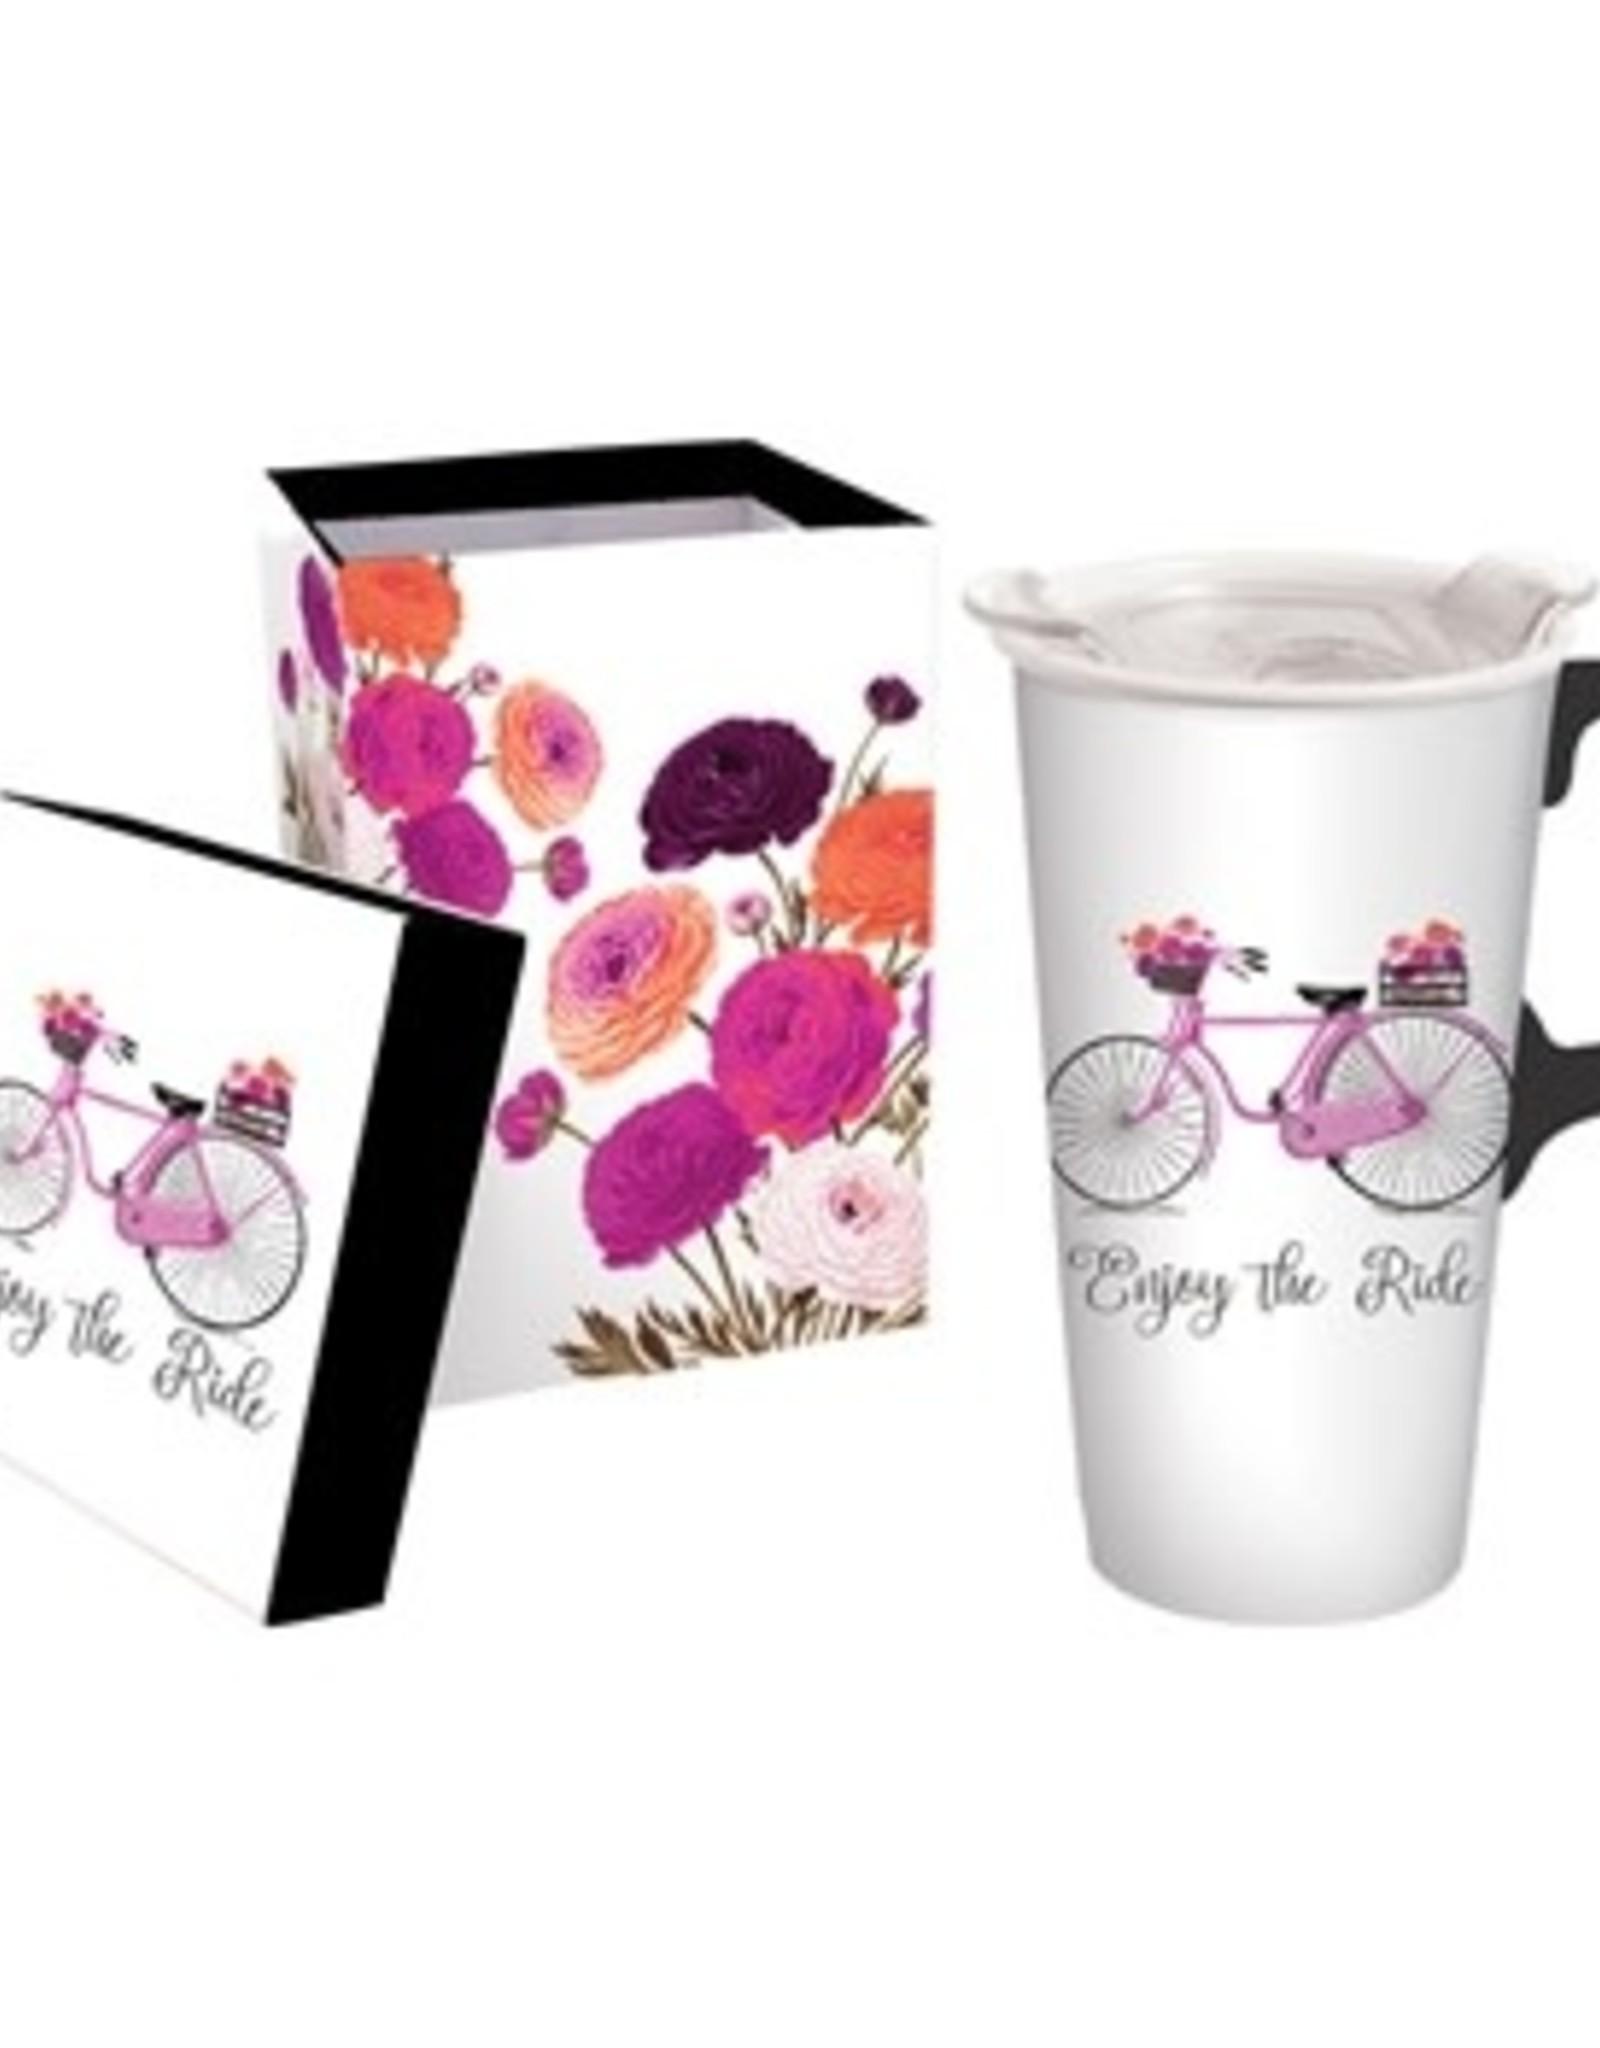 17oz Ceramic Travel Mug with Decorative Box